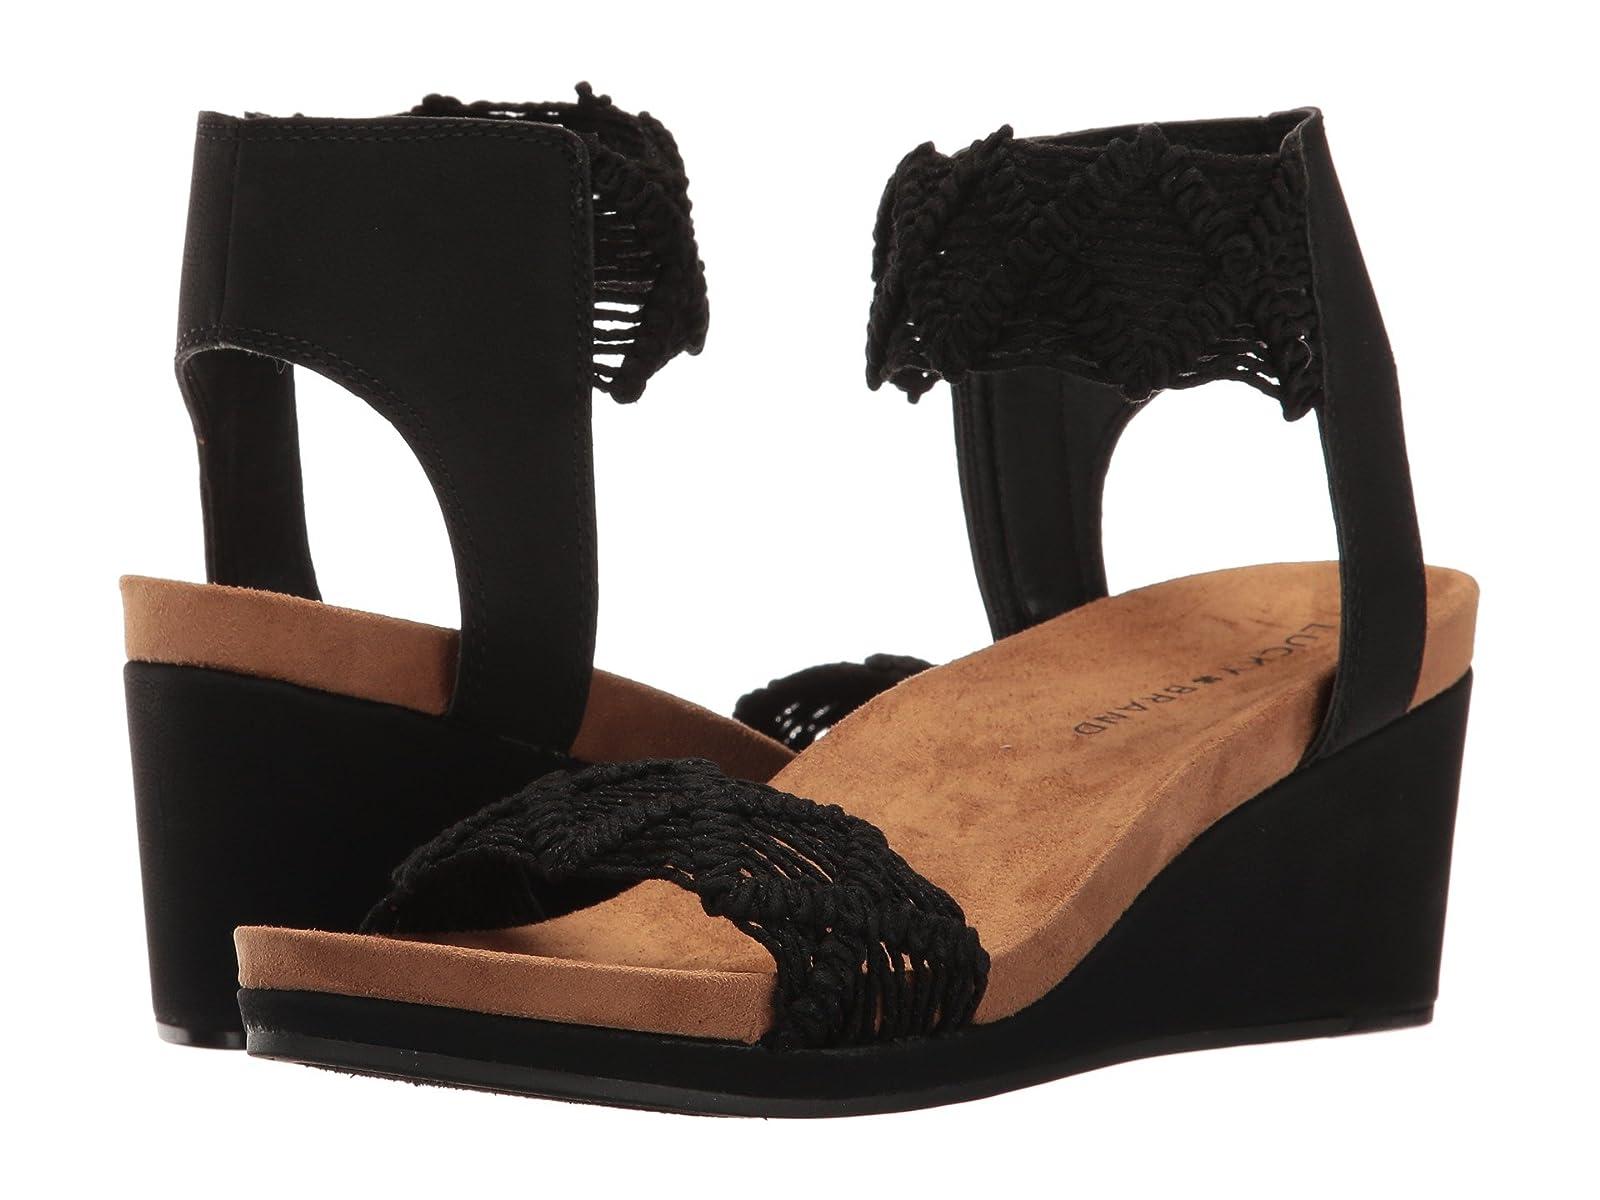 Lucky Brand KierloCheap and distinctive eye-catching shoes